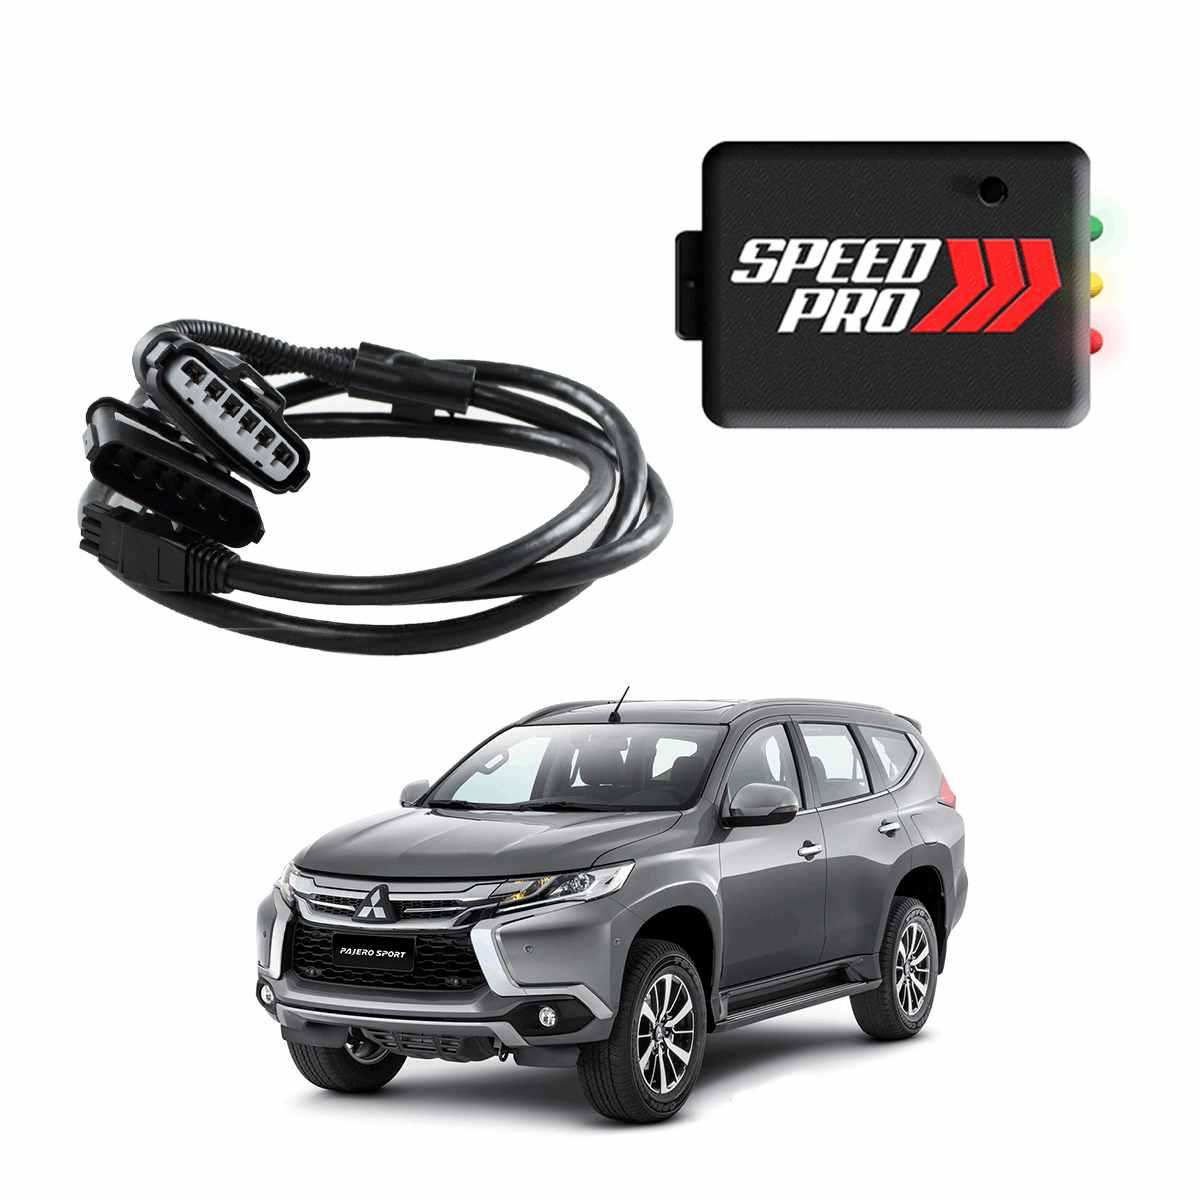 Chip De Potência Para Pedal Speedpro Para Mitsubishi Pajero Sport 2.4 Diesel